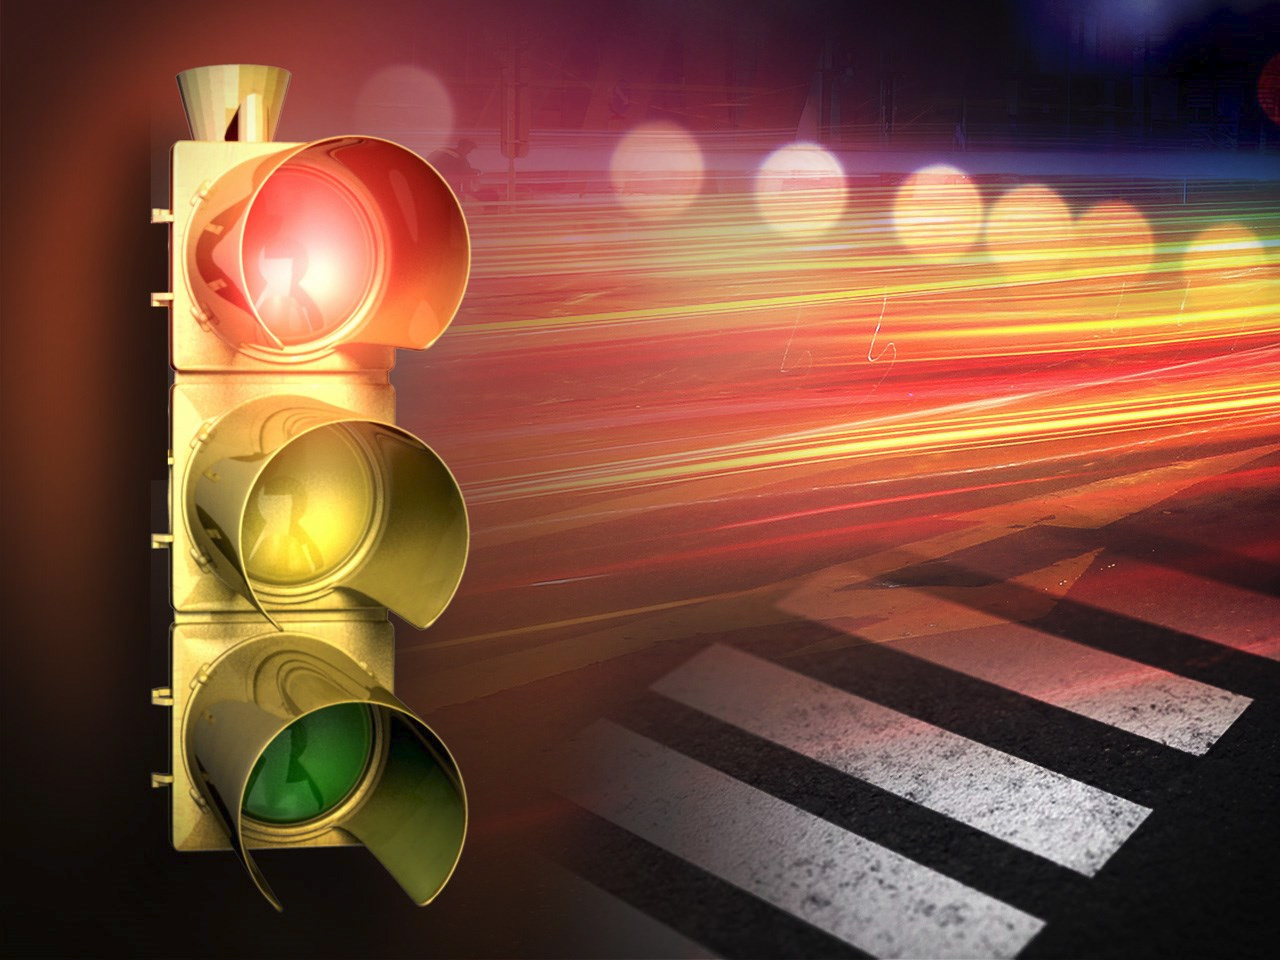 traffic crosswalk_1542129667729.jpg.jpg